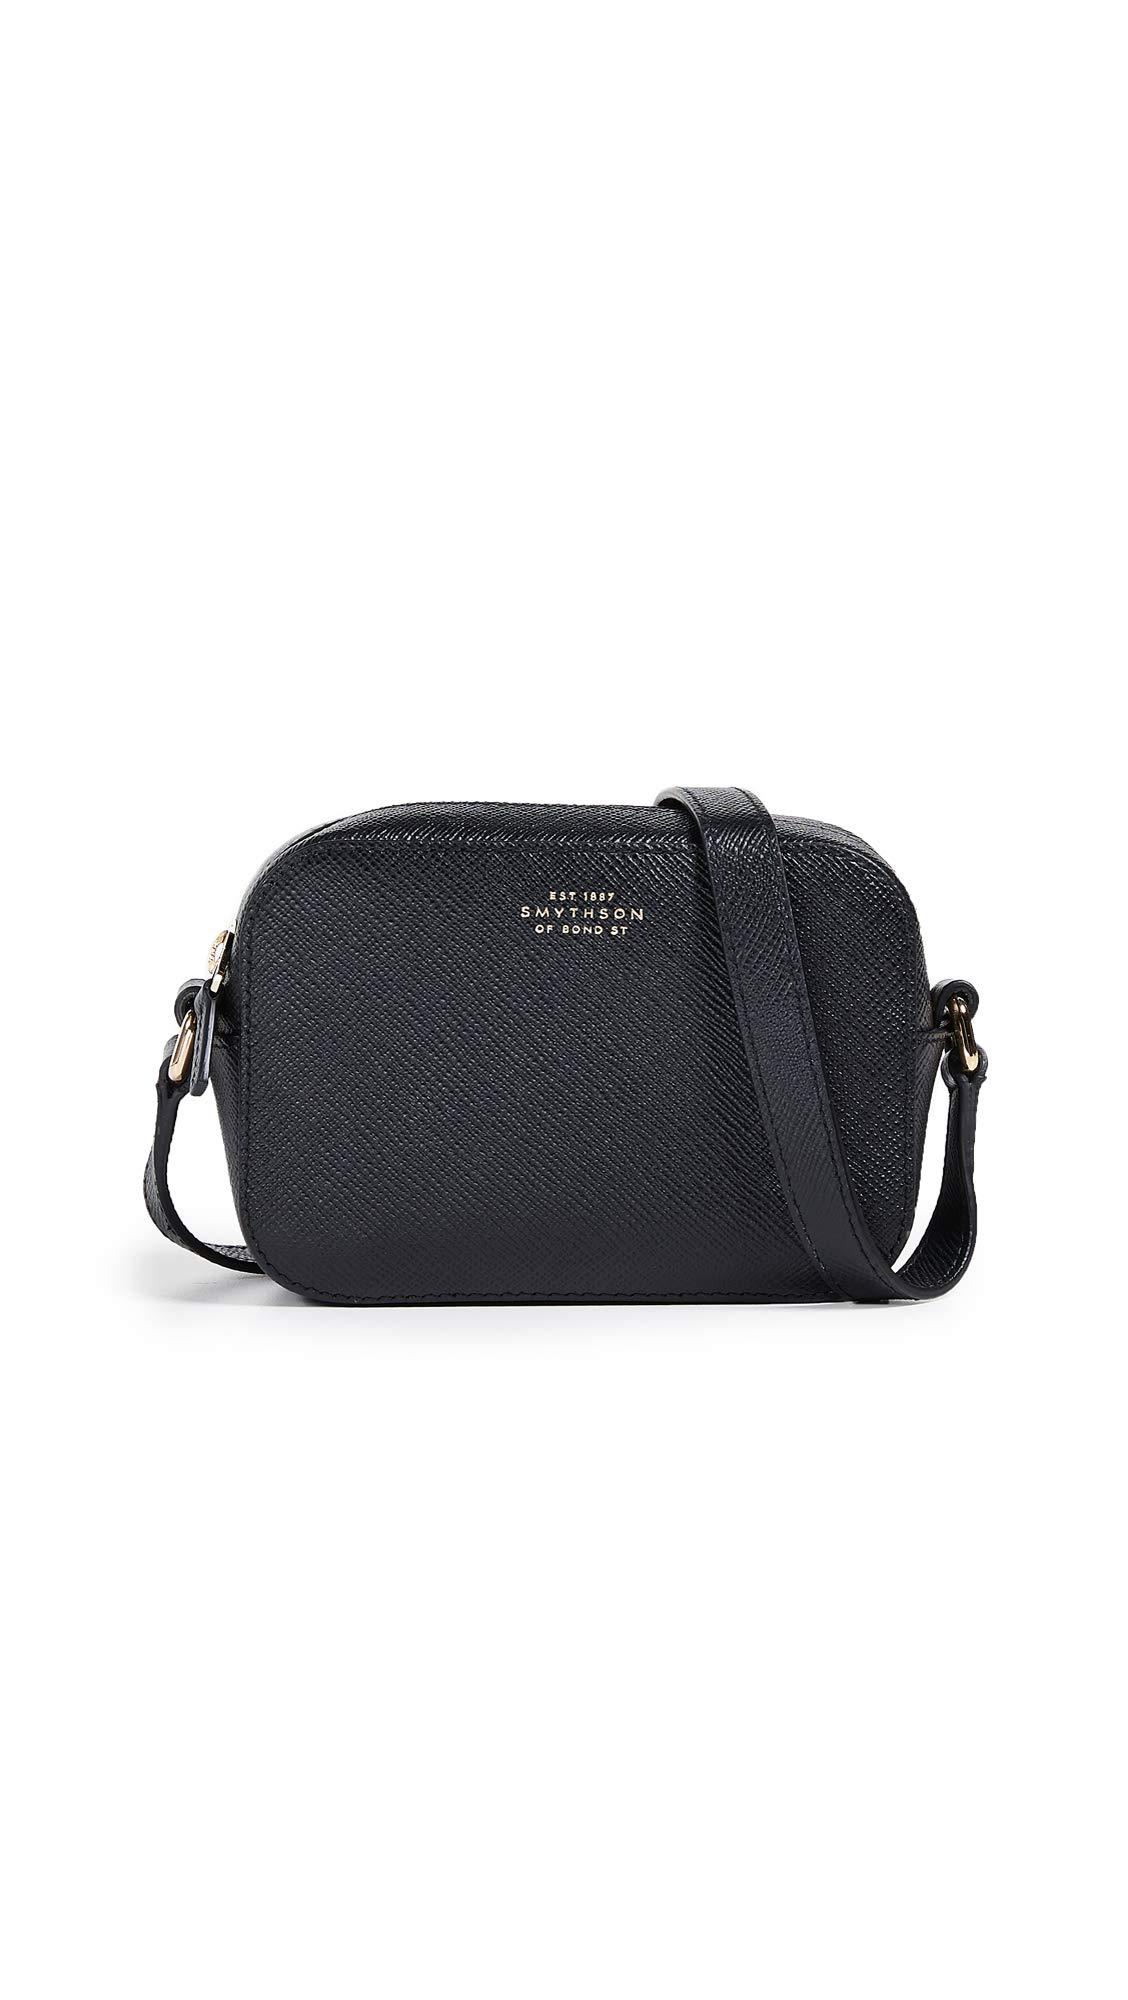 Smythson Women's Panama Mini Camera Bag with Leather Strap